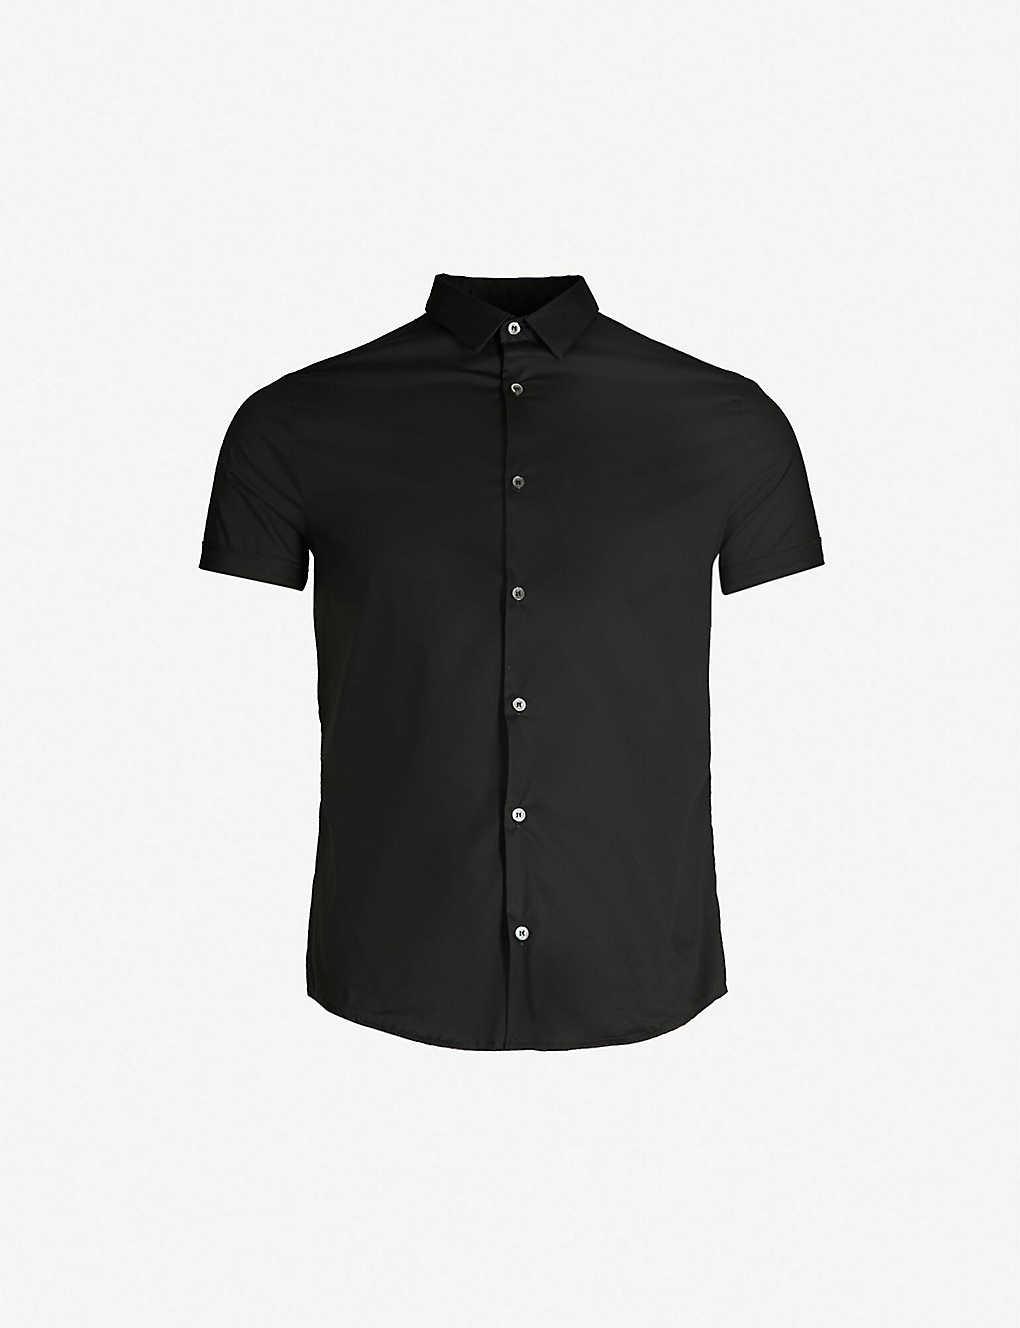 EMPORIO ARMANI - Slim-fit cotton-blend short sleeves shirt ... 7923a5e60b8df